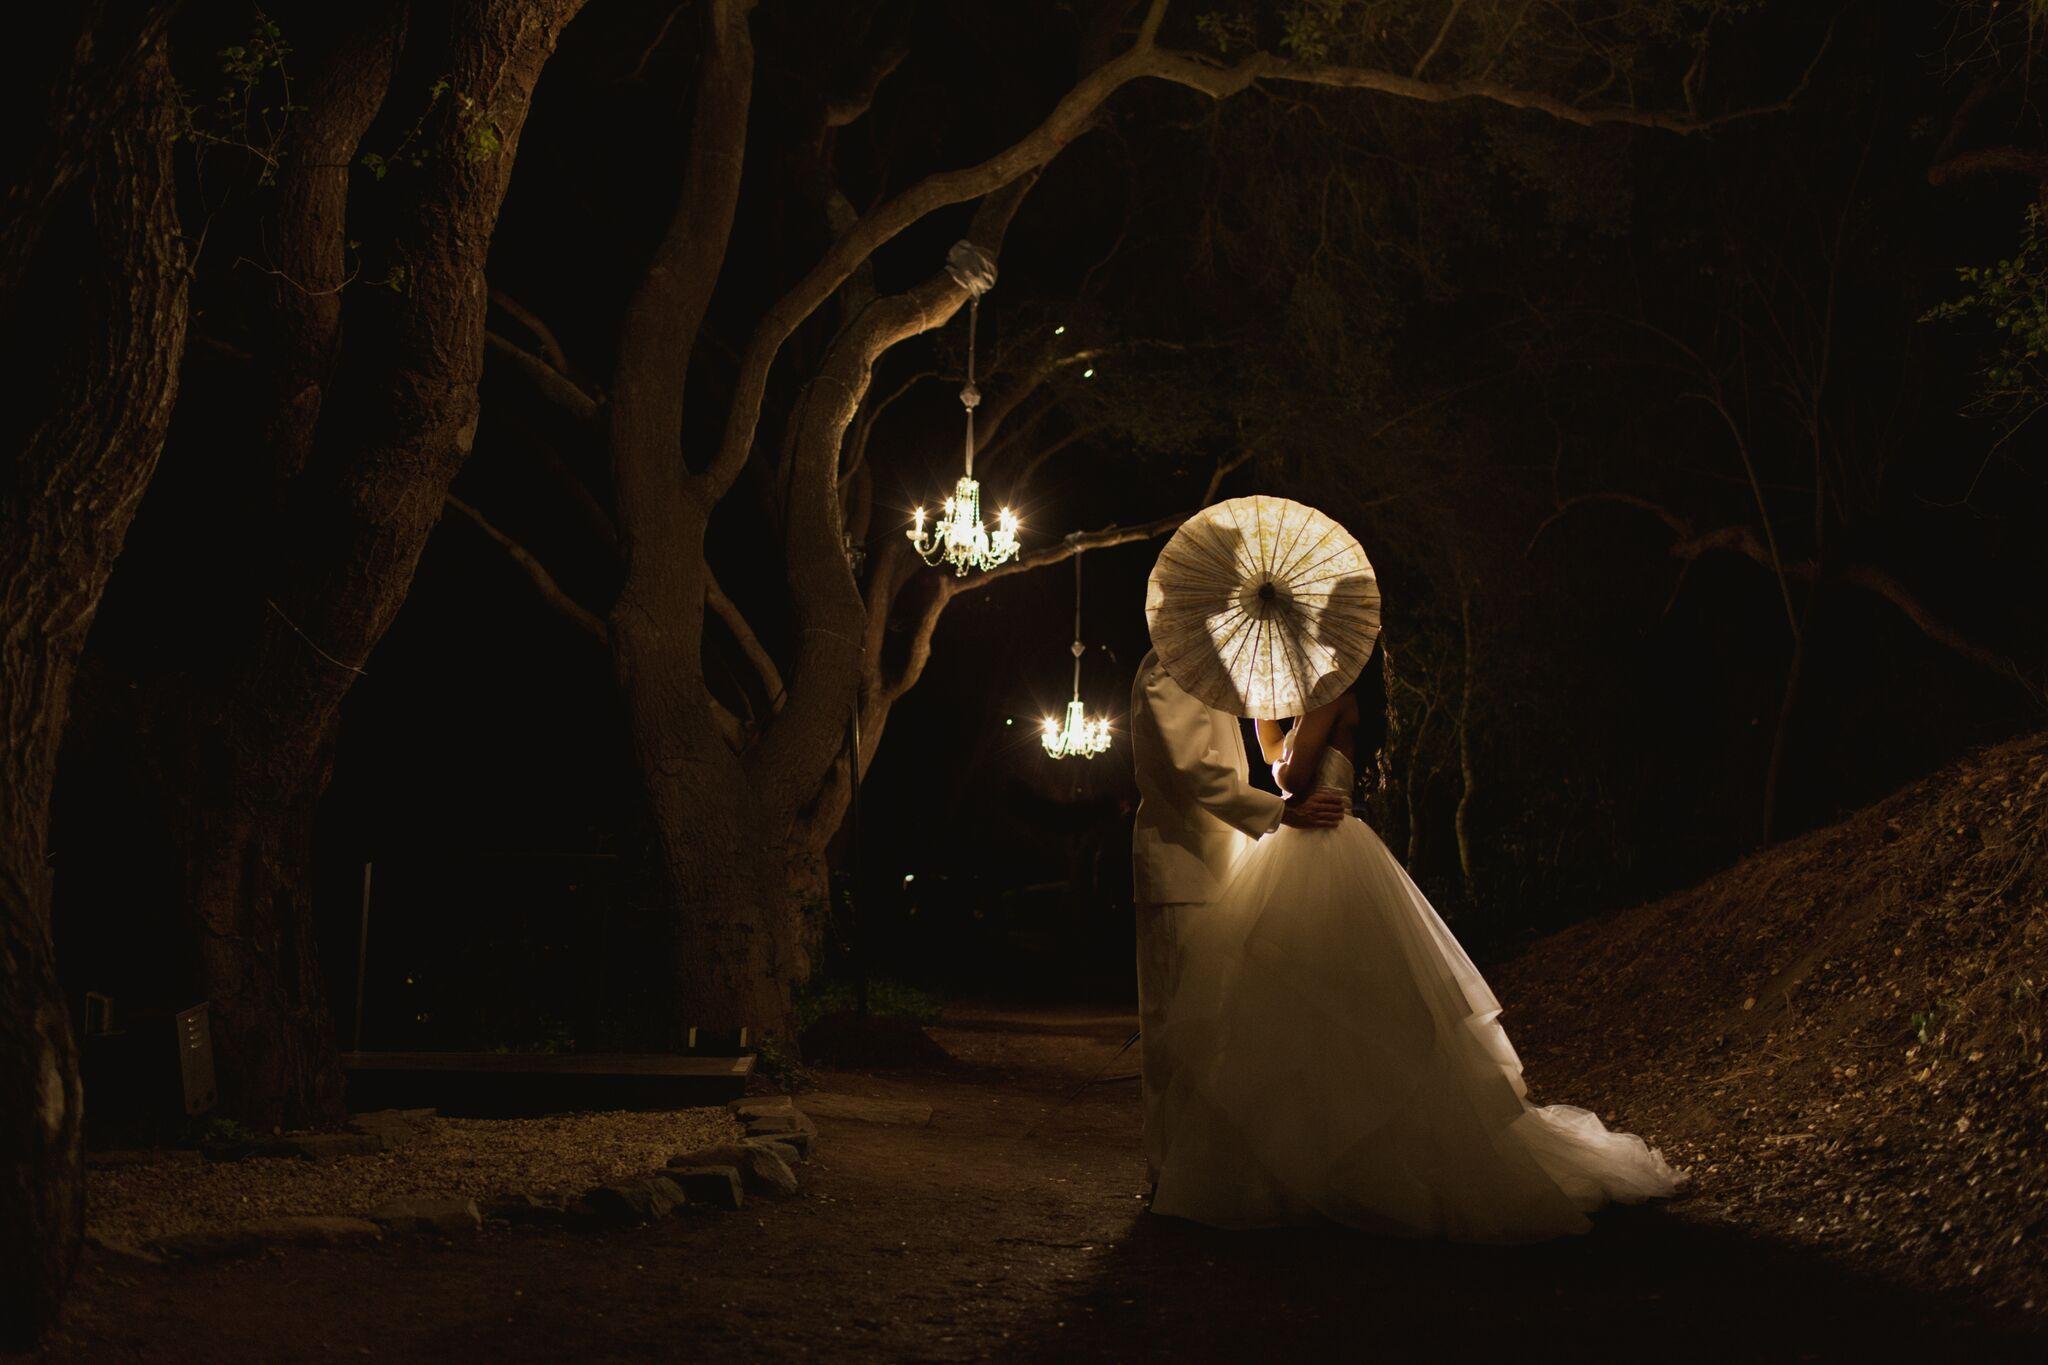 Nightime On The Trails Golden Door Spa In San Diego San Marcos Ca Weddings Wedding Venue Golden Door Spa Golden Door Nature